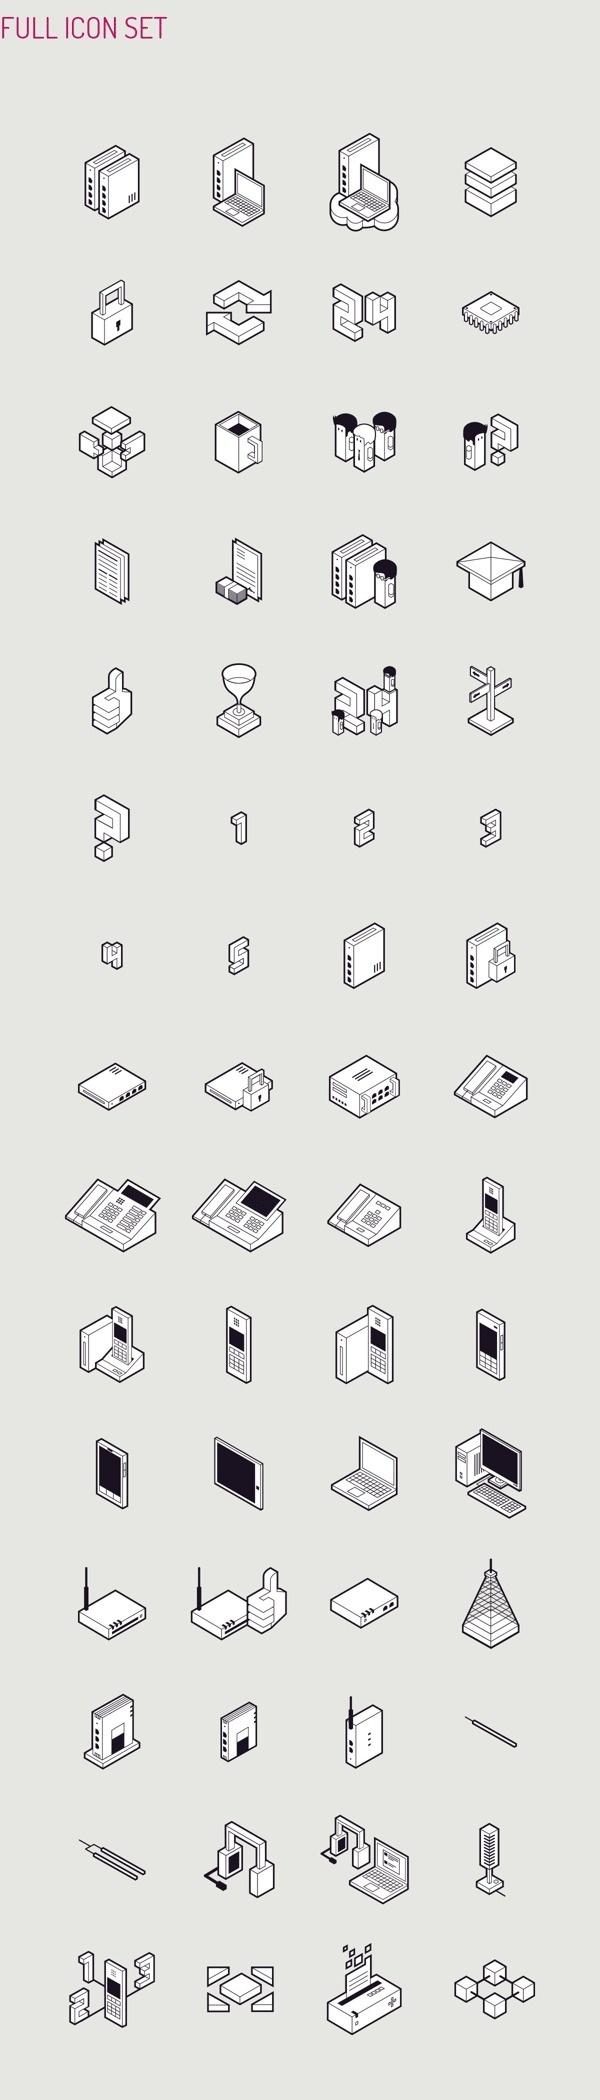 Datera SA   Isometric Icon Set designed by Perconte